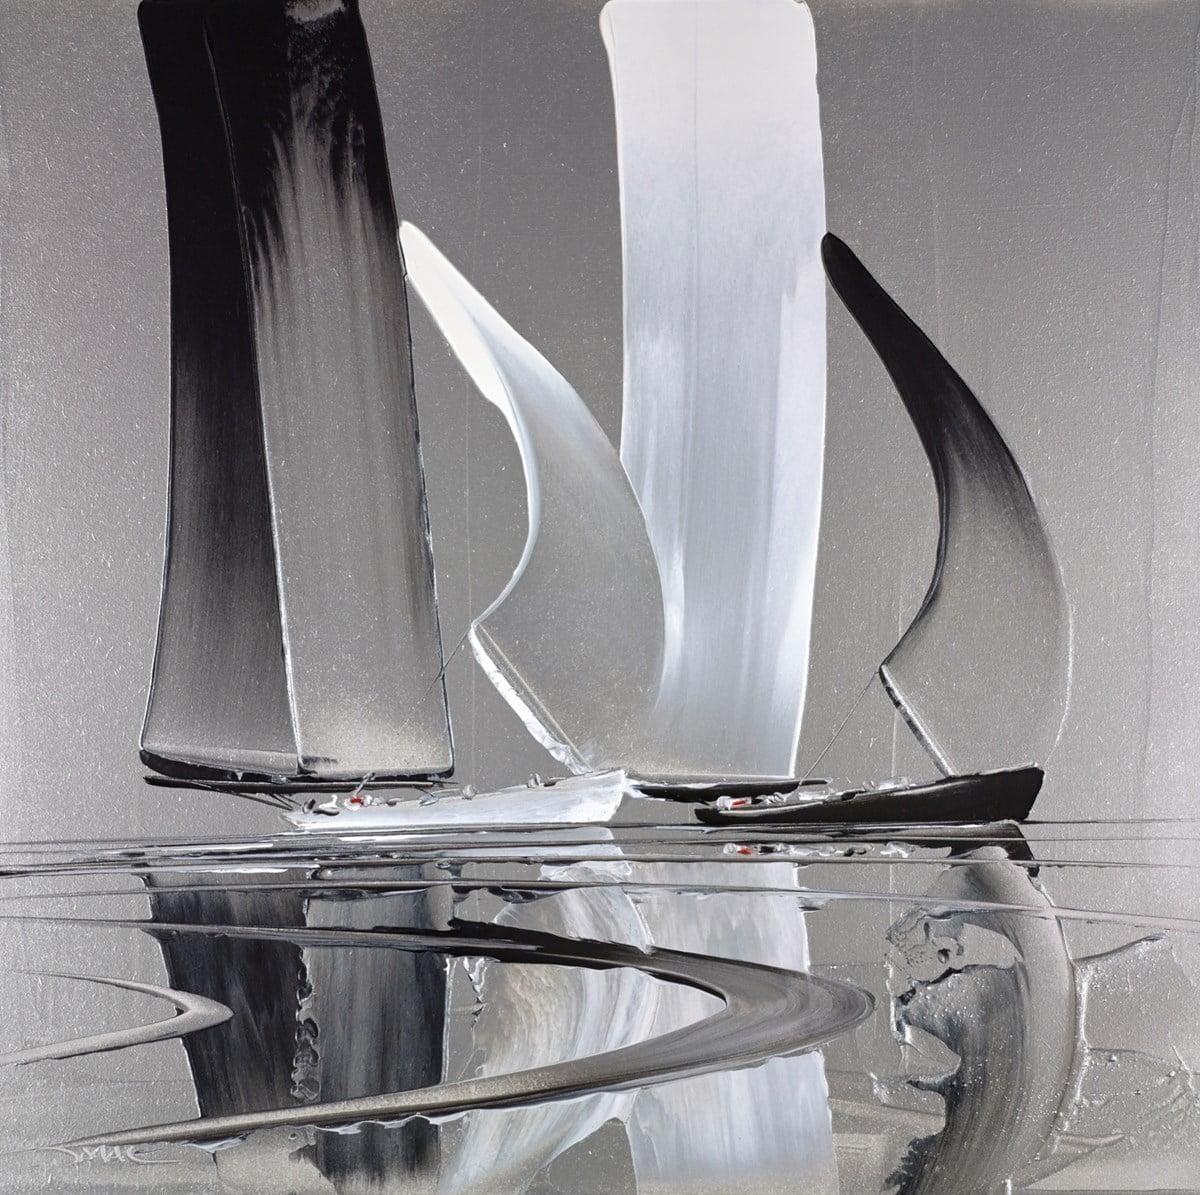 Sailing Over Silver ~ Duncan MacGregor